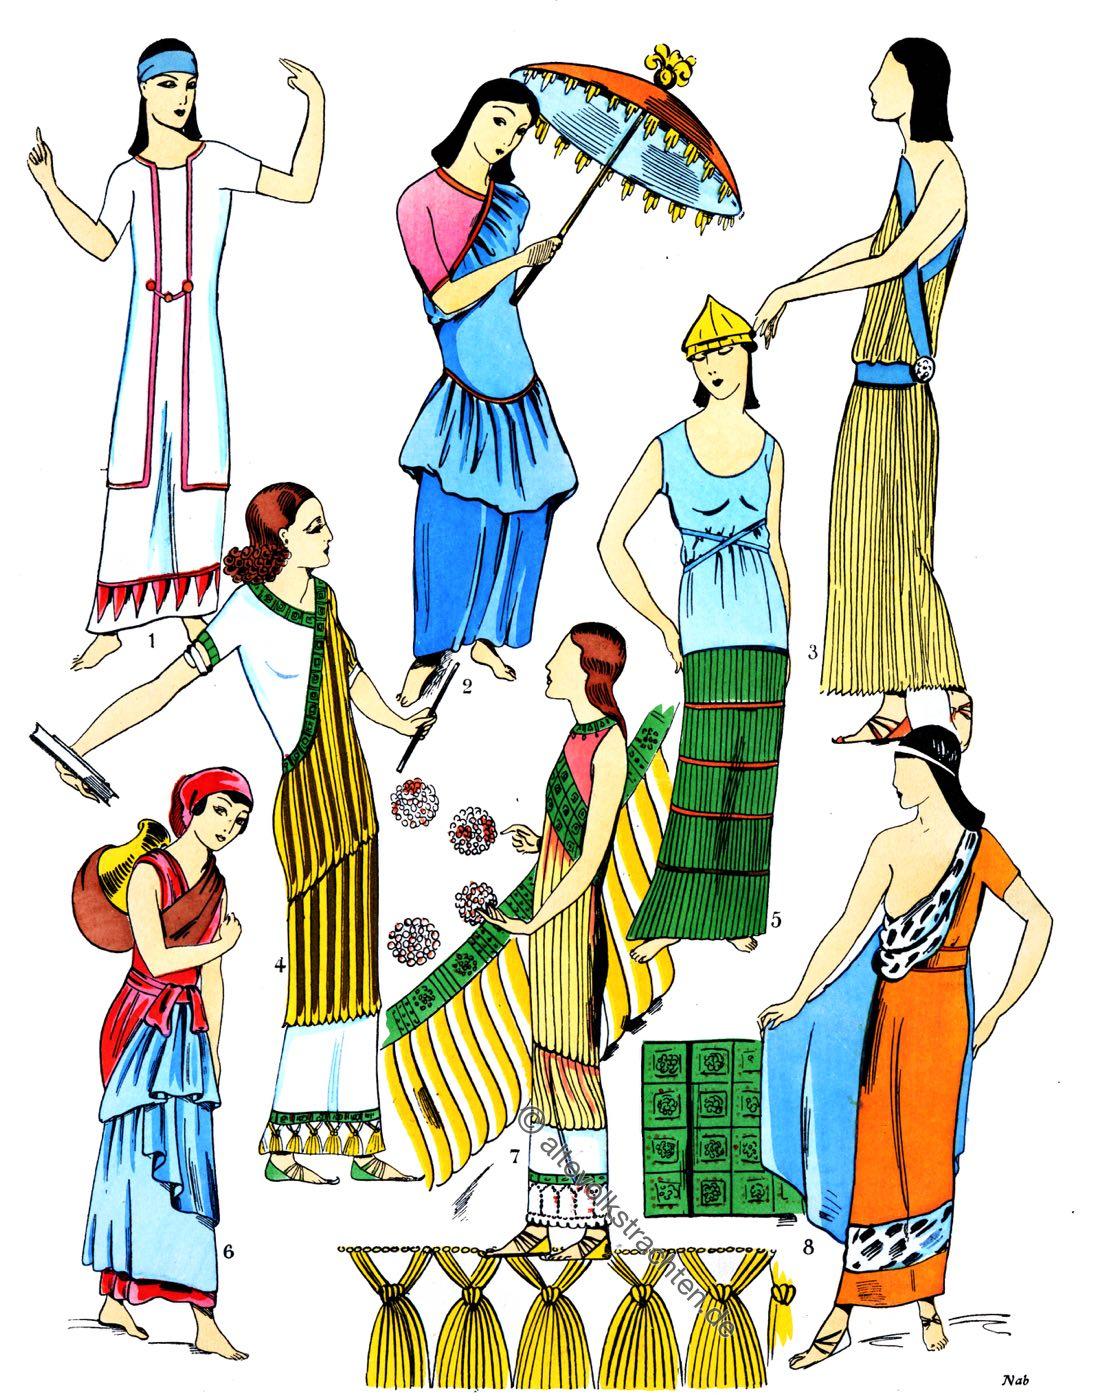 Assyrien, Mesopotamien, Kostüme, Röcke, Trachten, Antike, Kostümgeschichte, Paul Louis de Giafferri